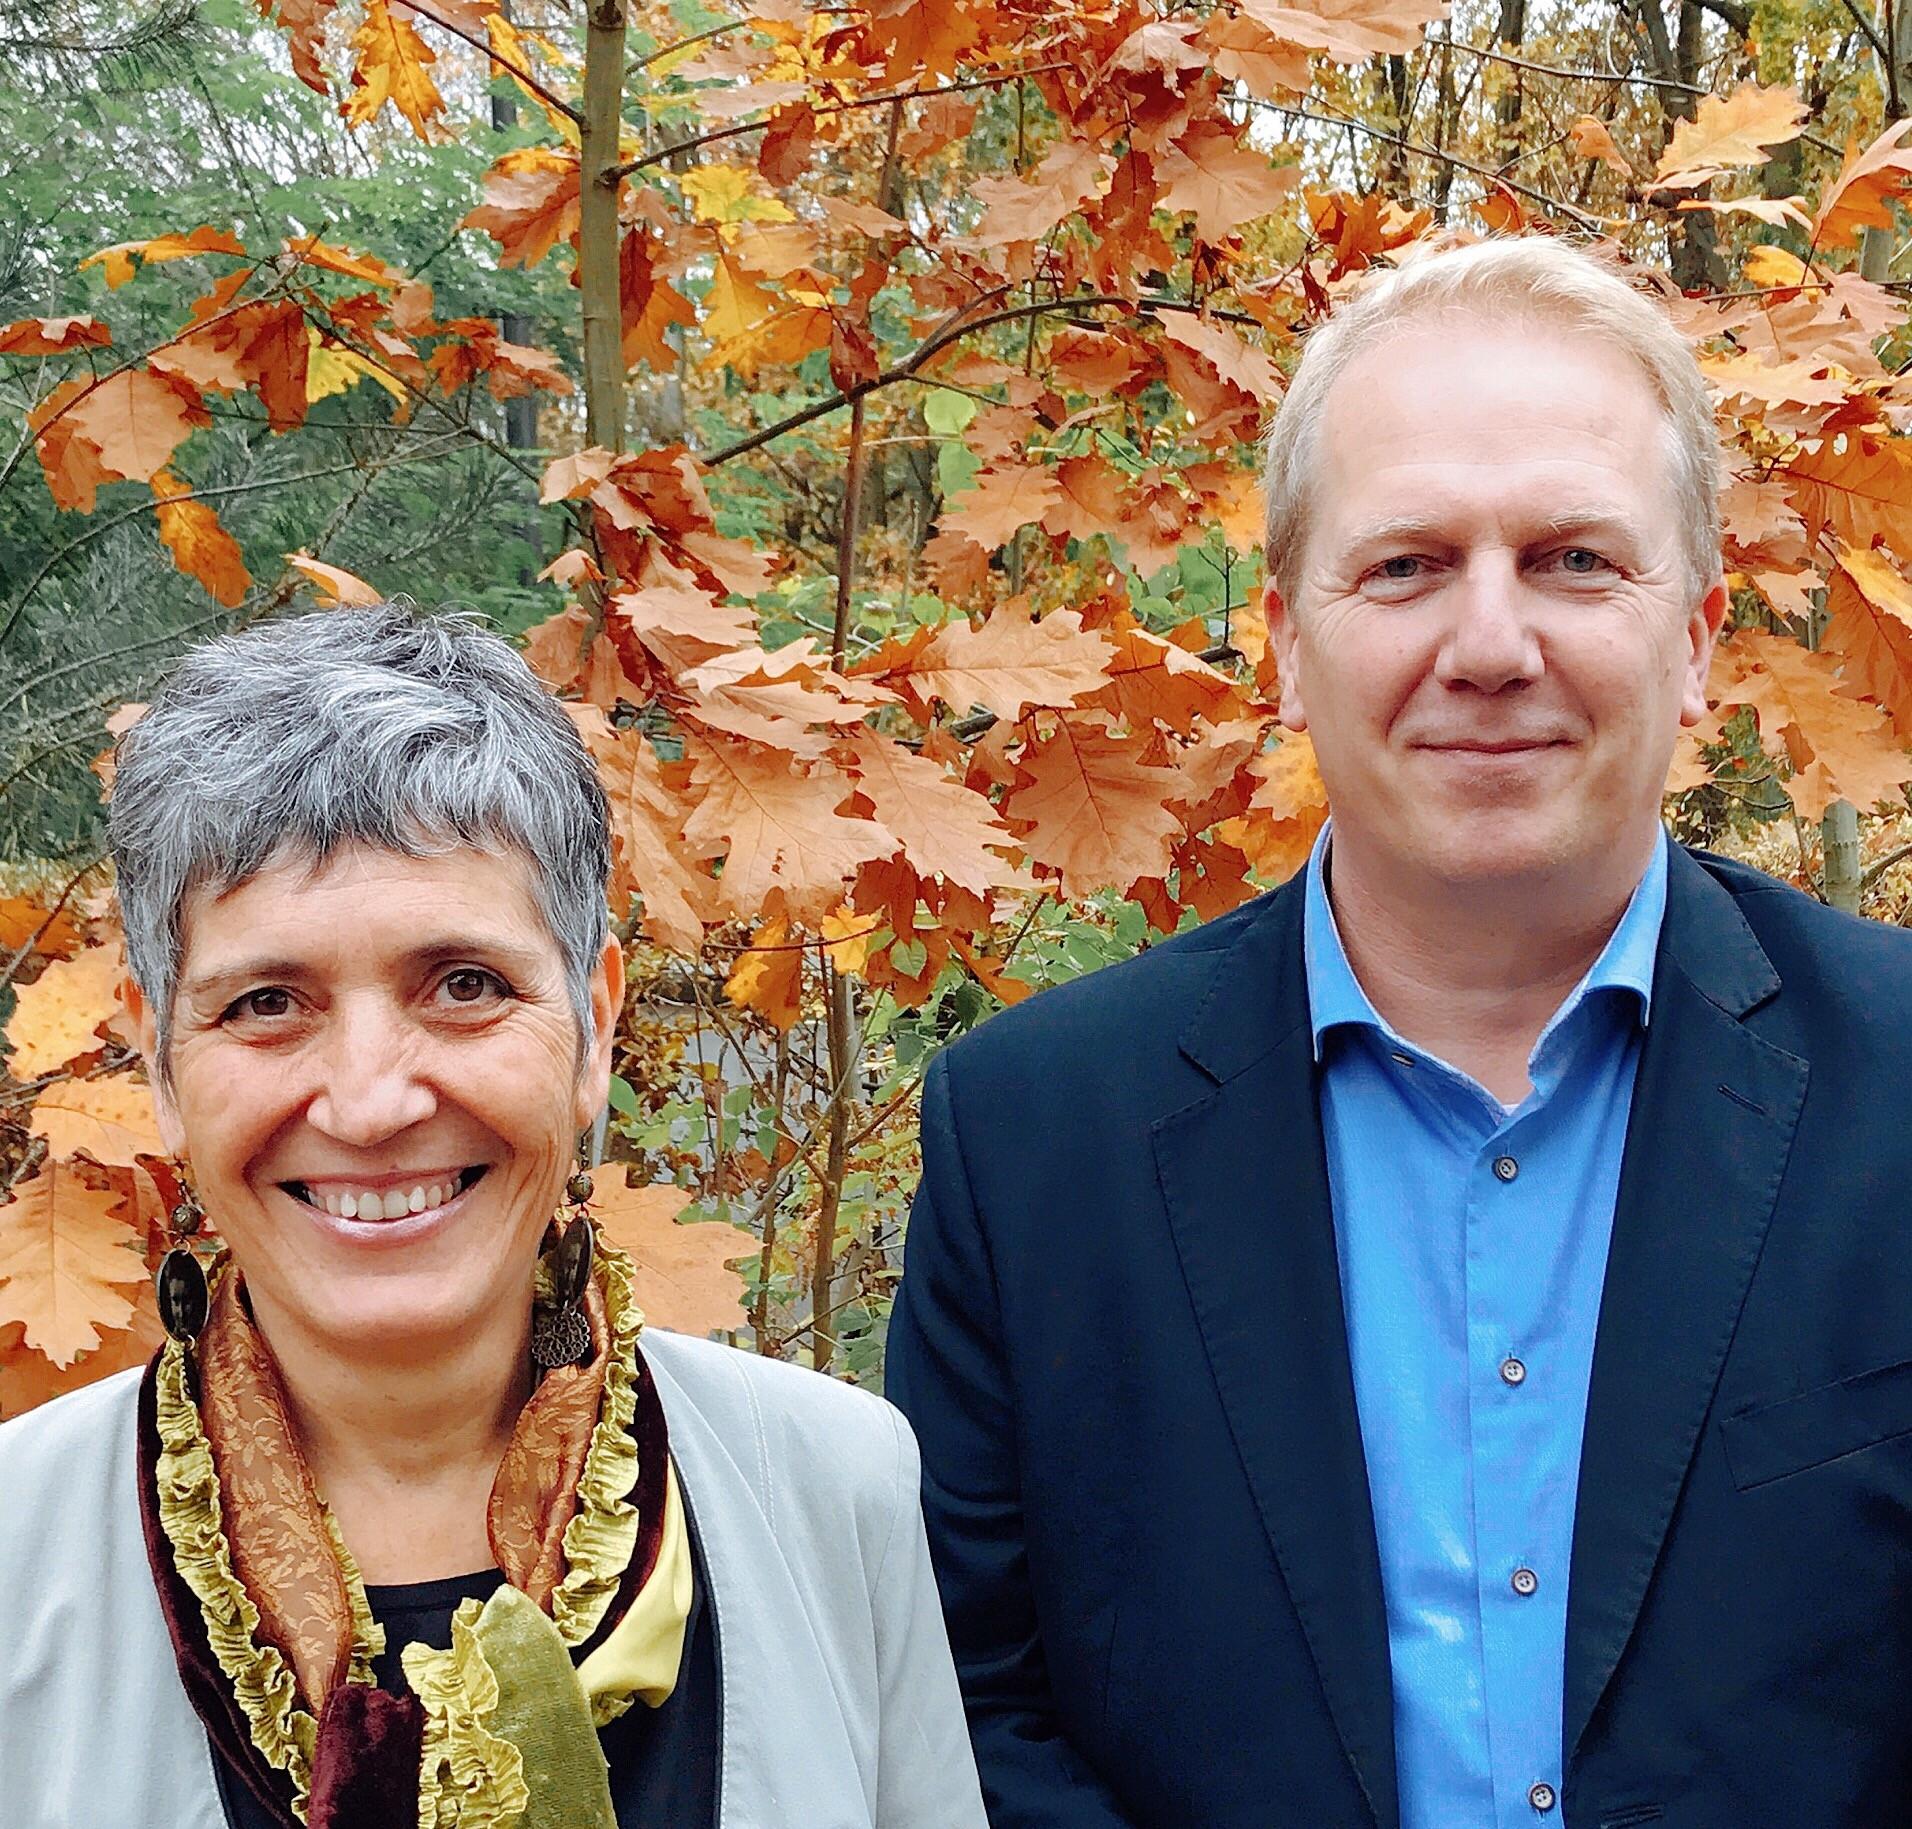 Sylvie-Anne Piette et Olivier Hollander, HEC Liège